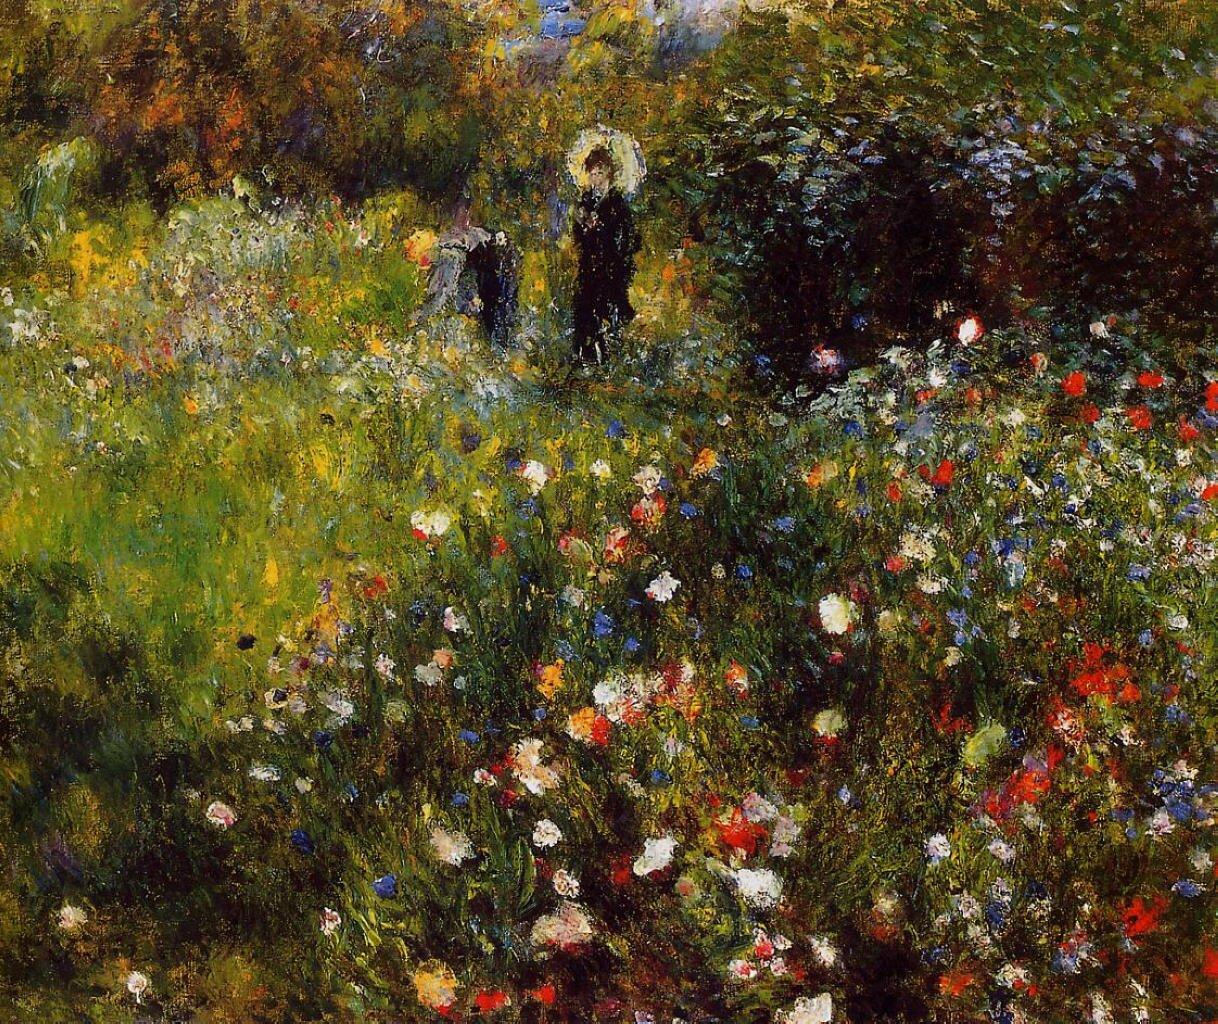 Letni pejzaż Źródło: Auguste Renoir, Letni pejzaż, domena publiczna.